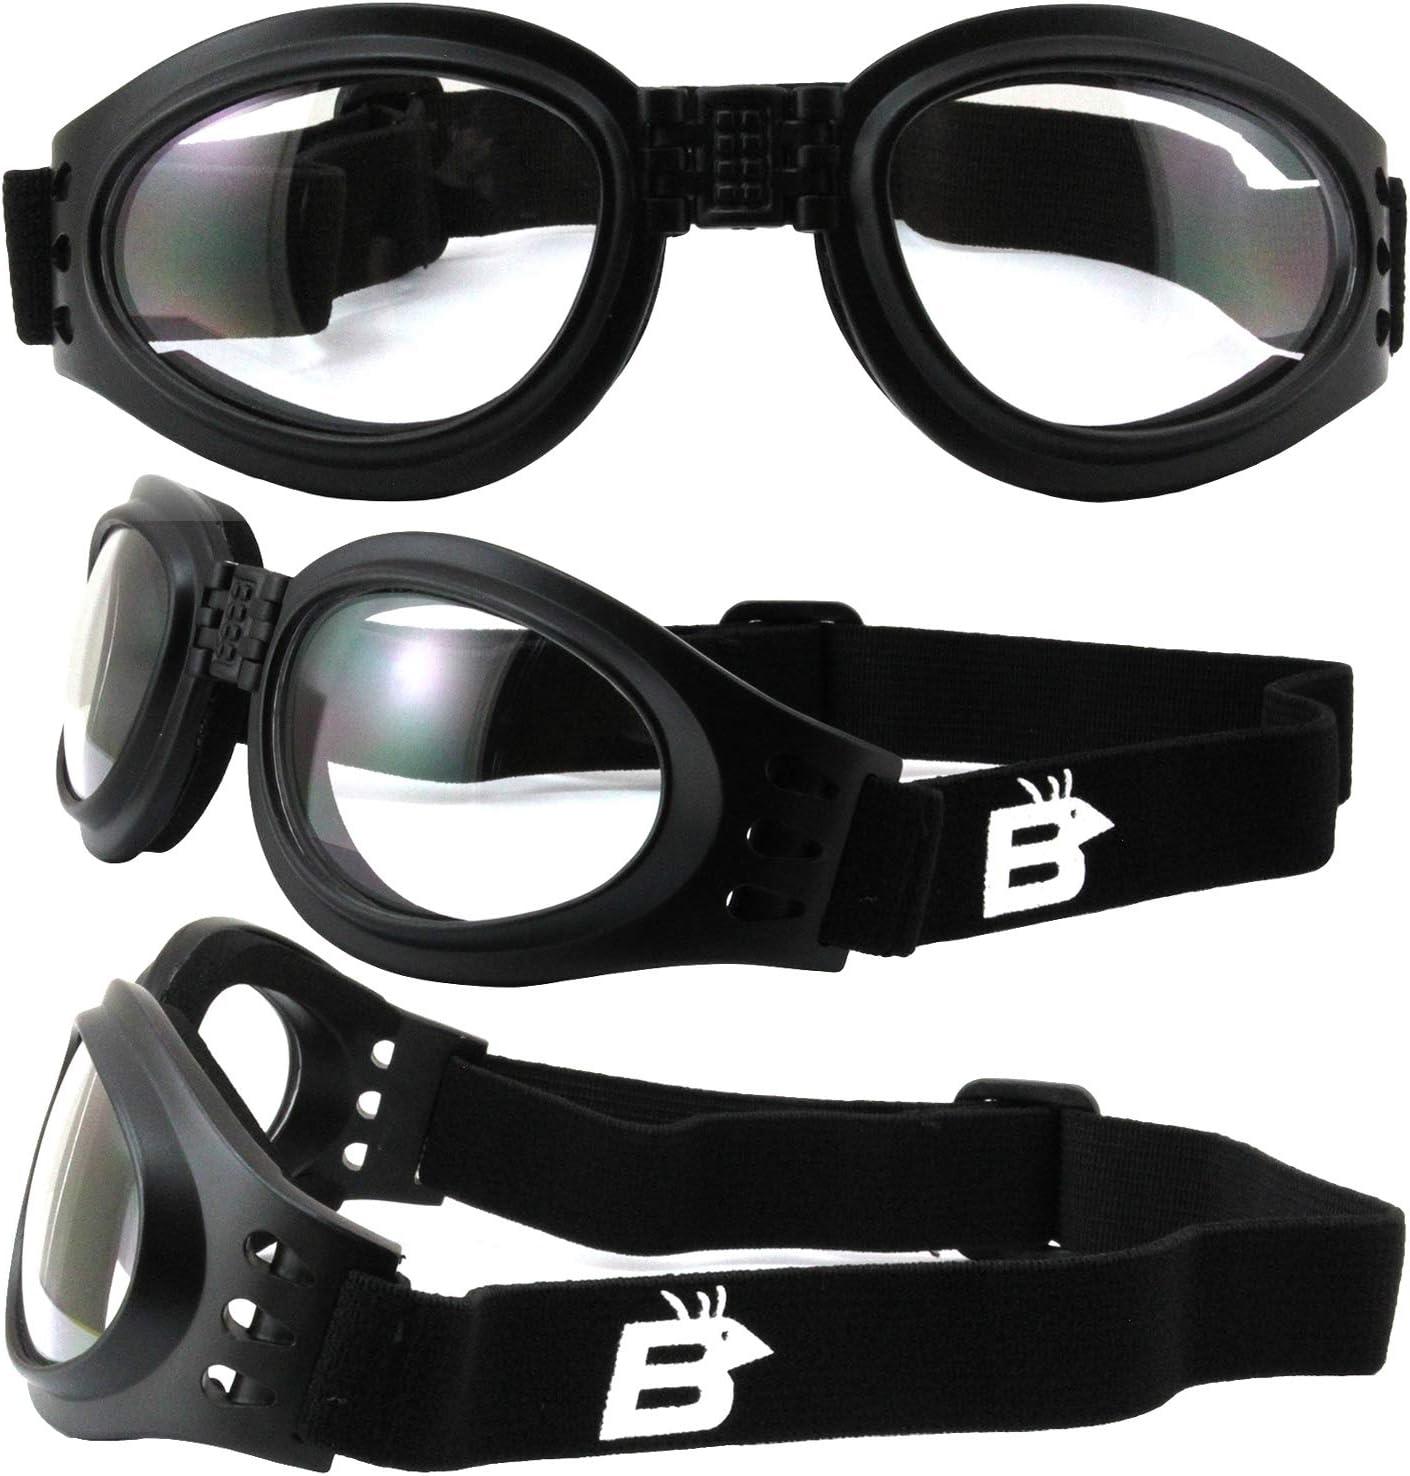 2 Pairs of Birdz Eyewear Parrot Black Padded Motorcycle Goggles Clear /& Smoke Lenses